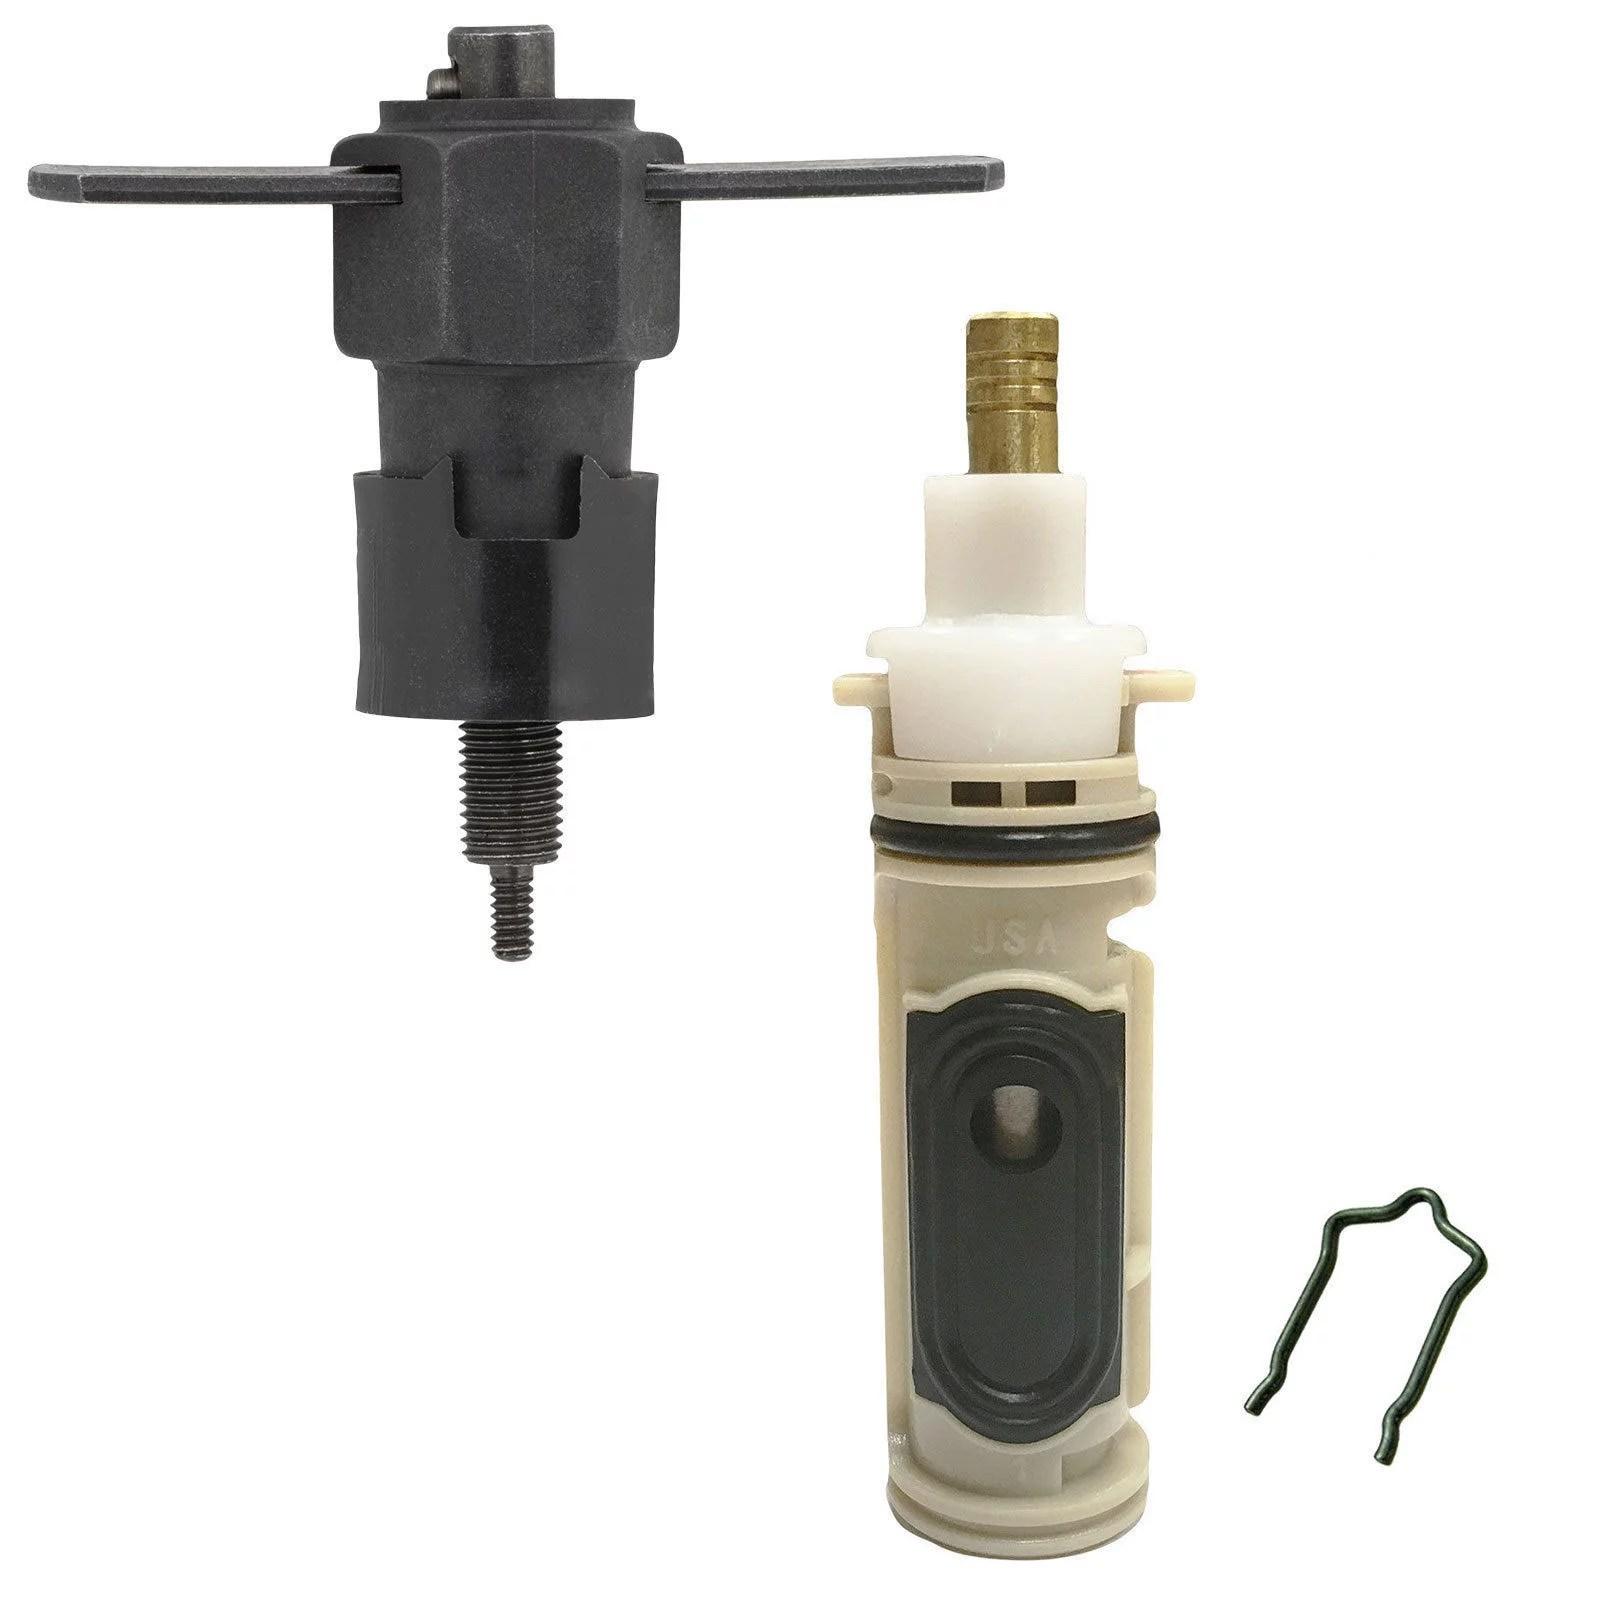 replacement kit 1222 1222b cartridge moen faucet includes puller tool walmart com